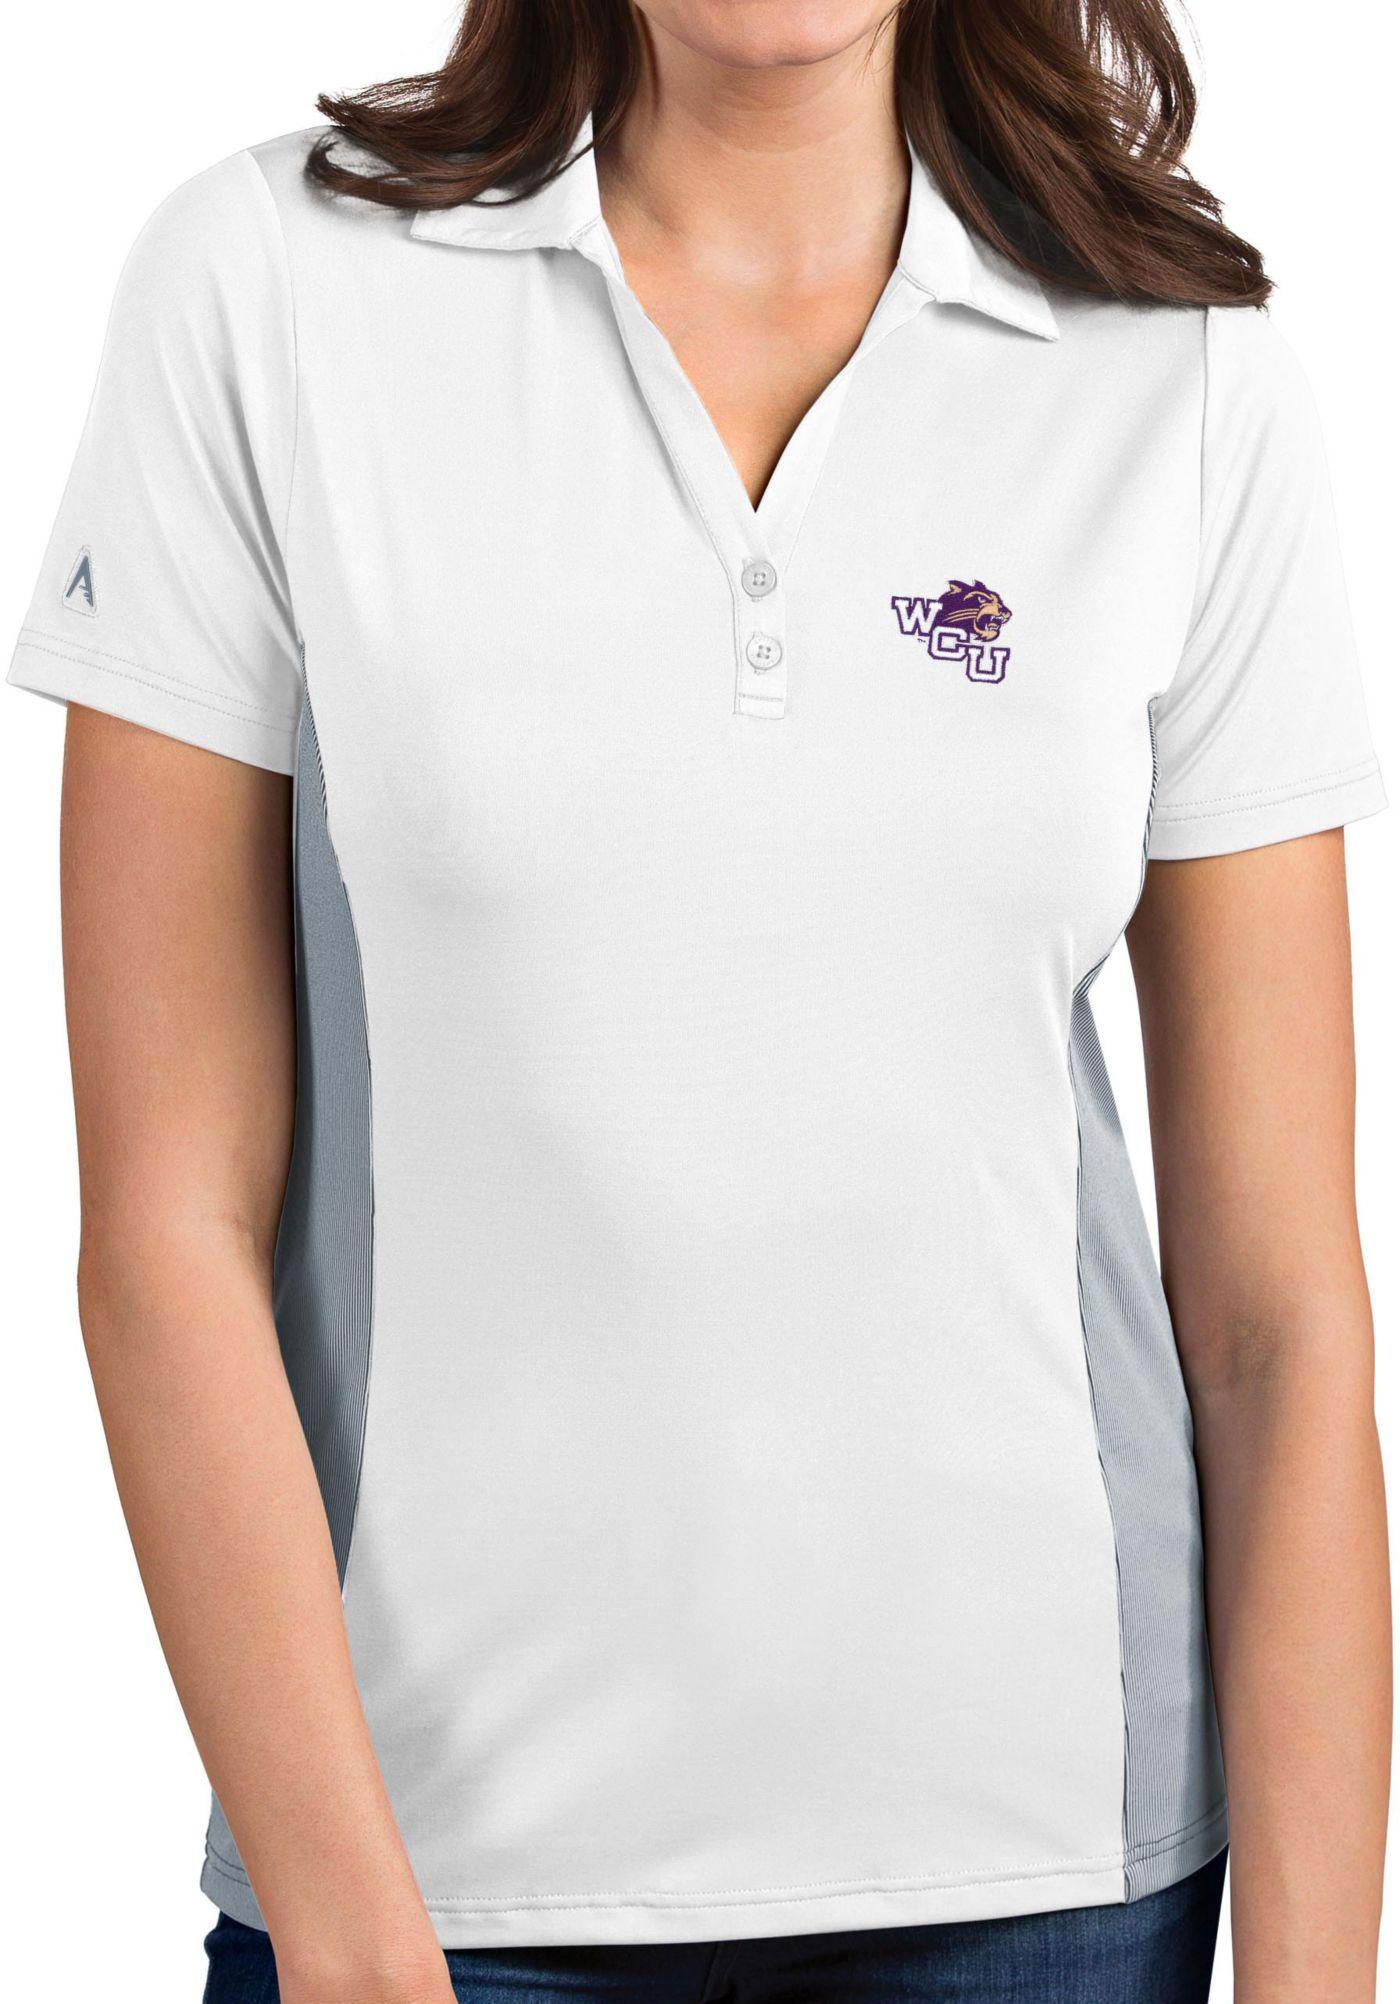 Antigua Women's Western Carolina Catamounts Venture White Polo